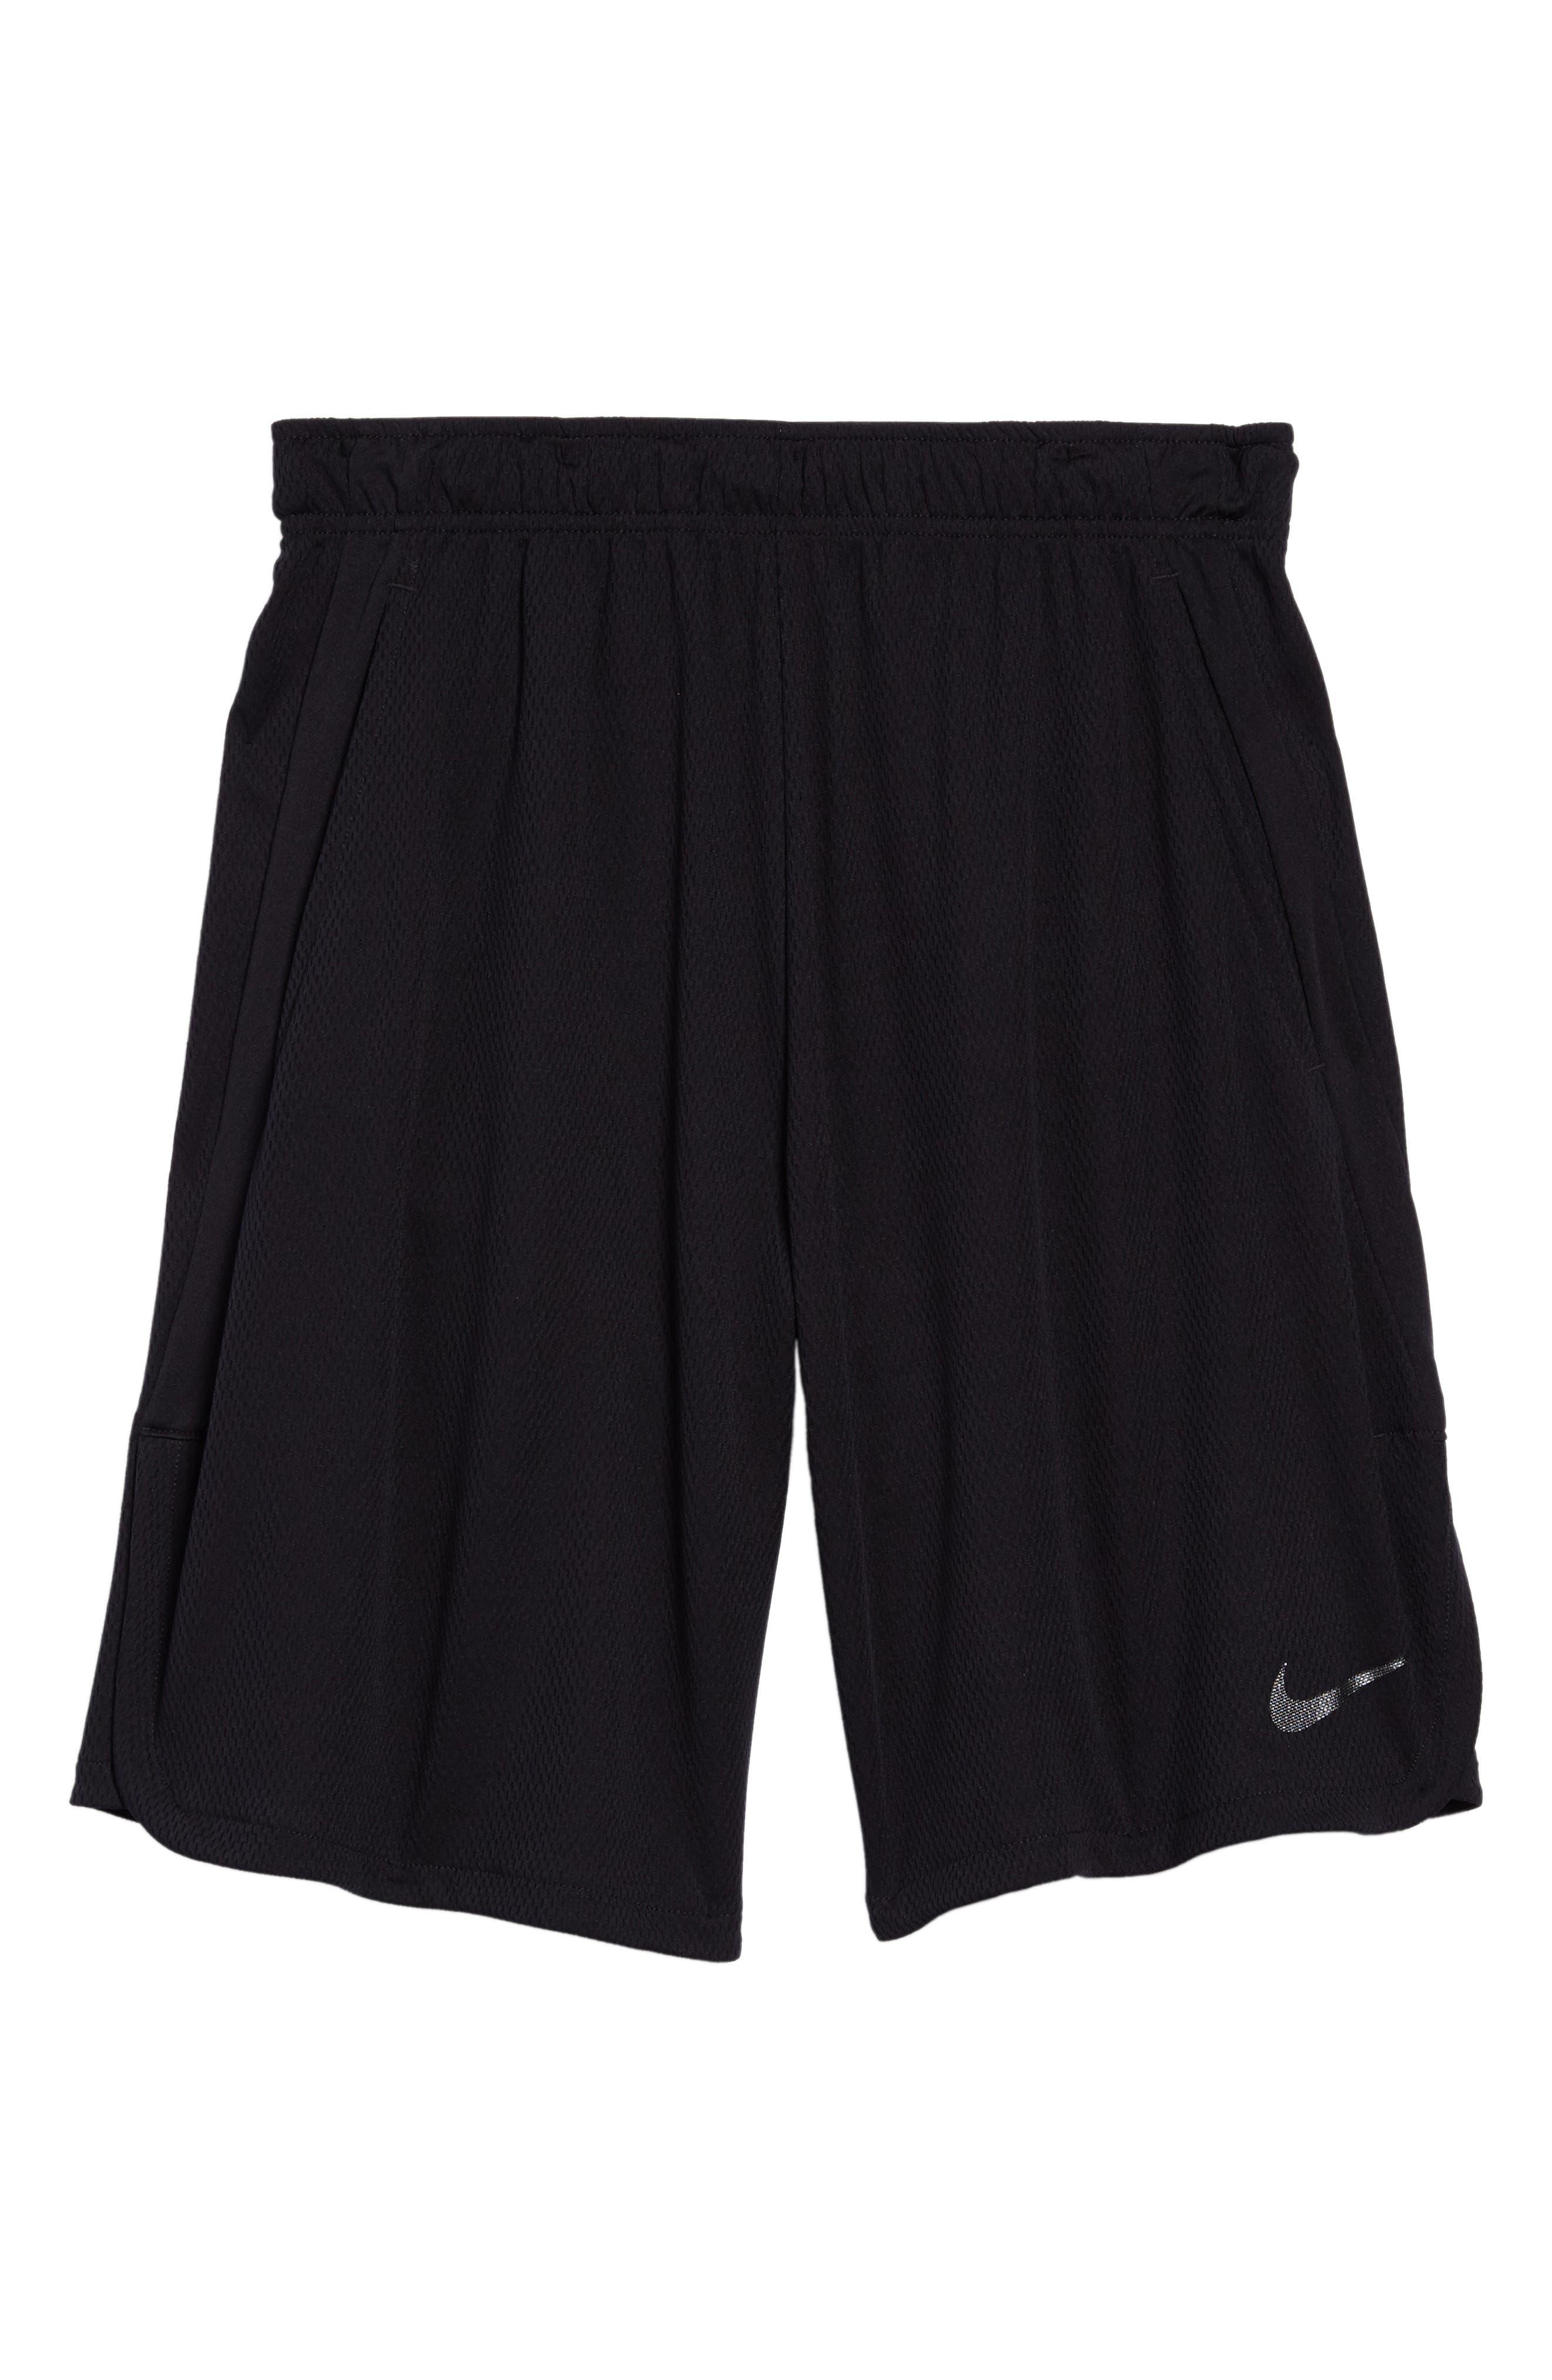 Training Dry 4.0 Shorts,                             Alternate thumbnail 31, color,